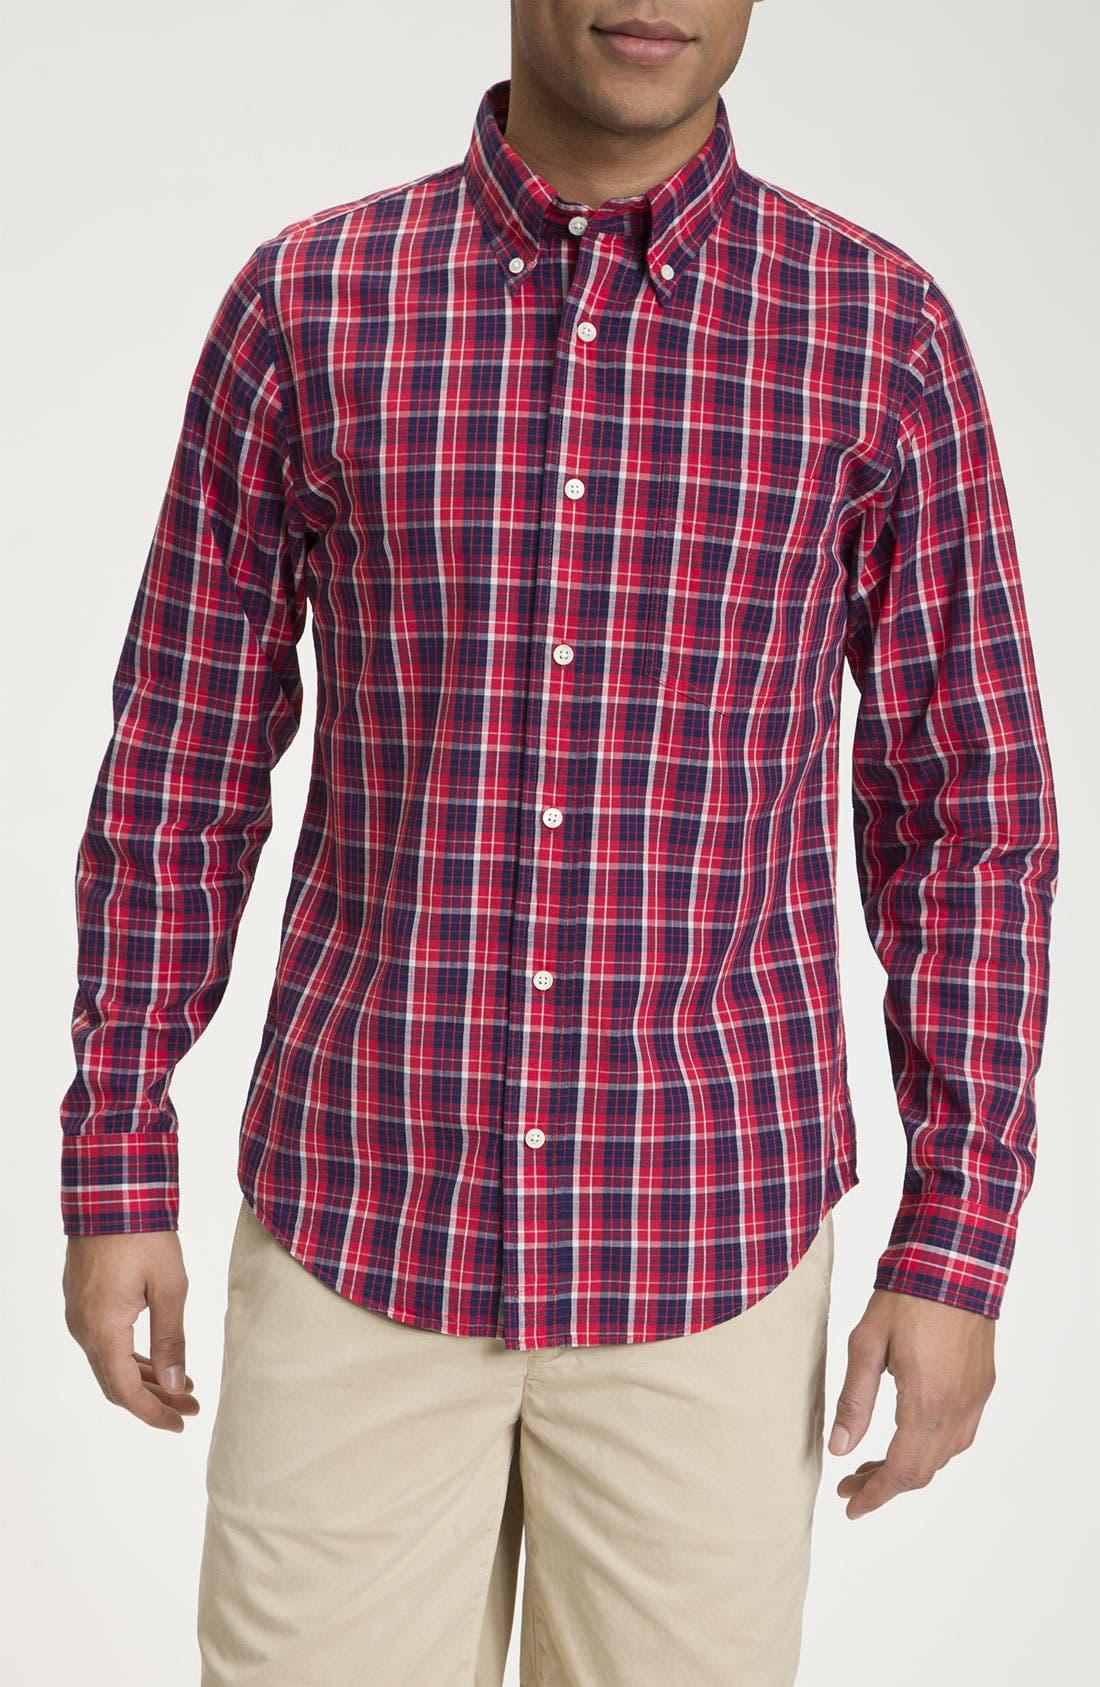 Main Image - Jack Spade 'Adler' Plaid Woven Shirt